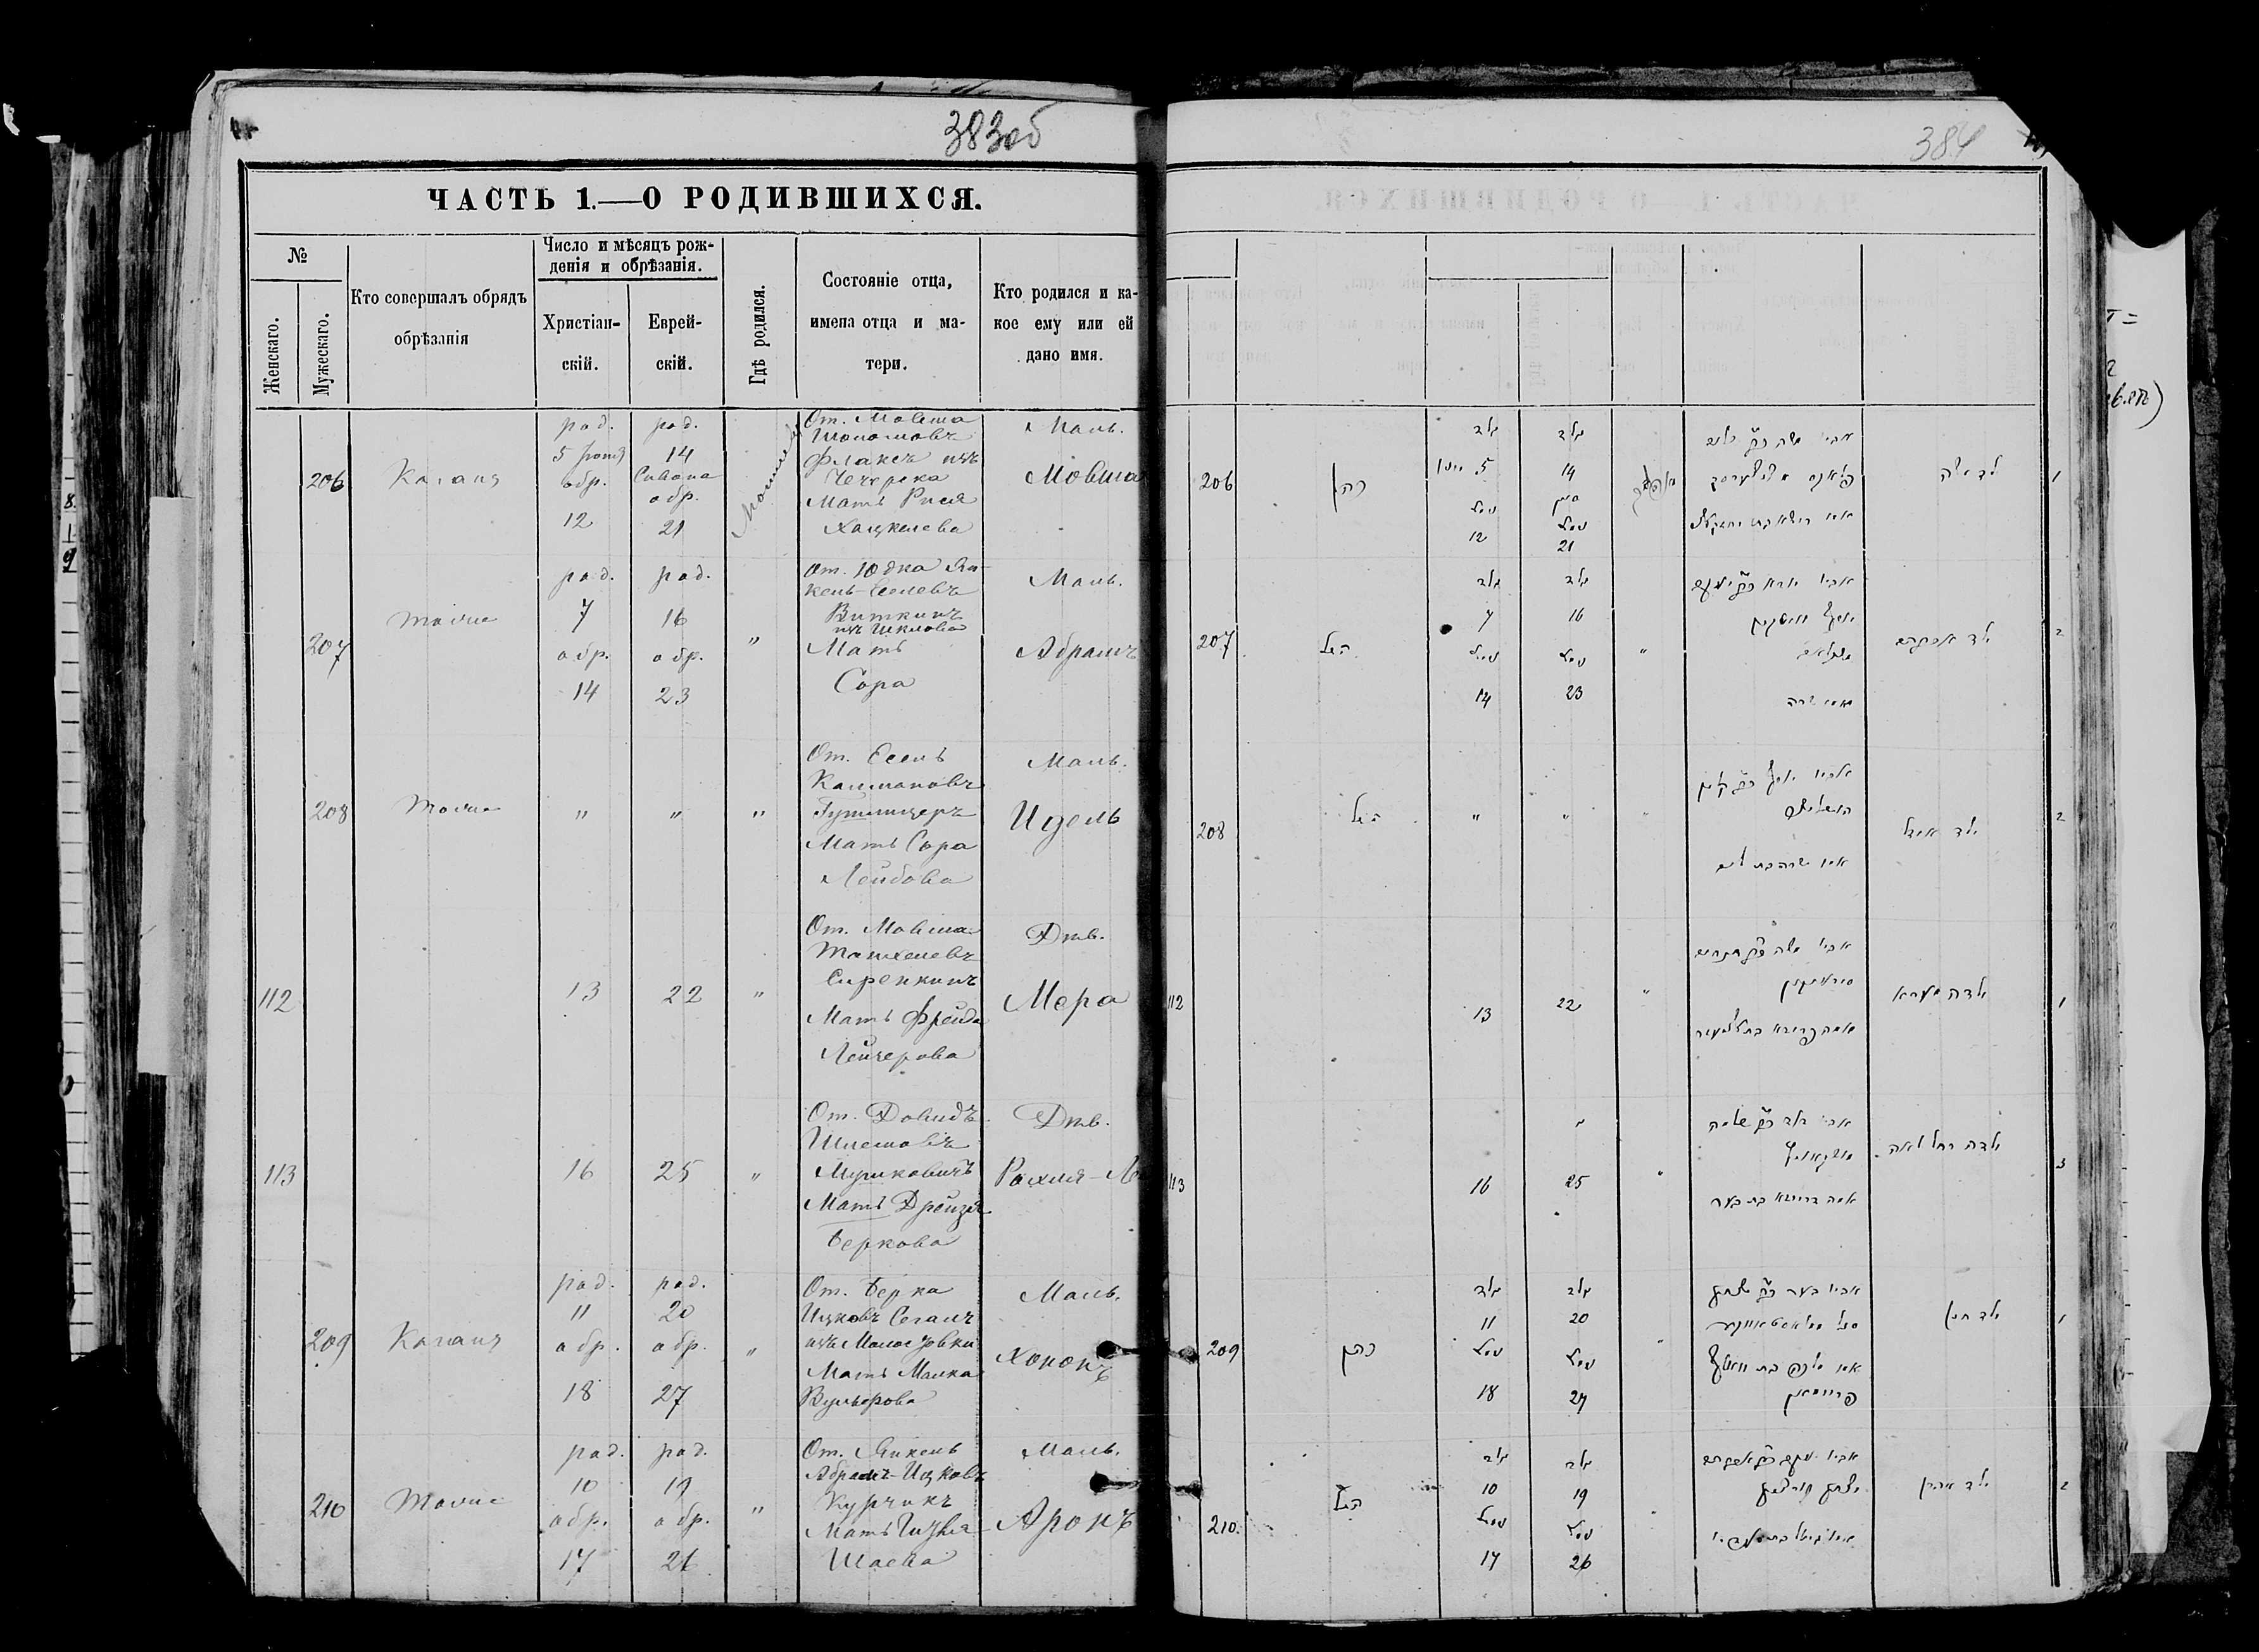 Арон Янкелевич Курчик 10 июня 1875, запись 210, пленка 007766481, снимок 55